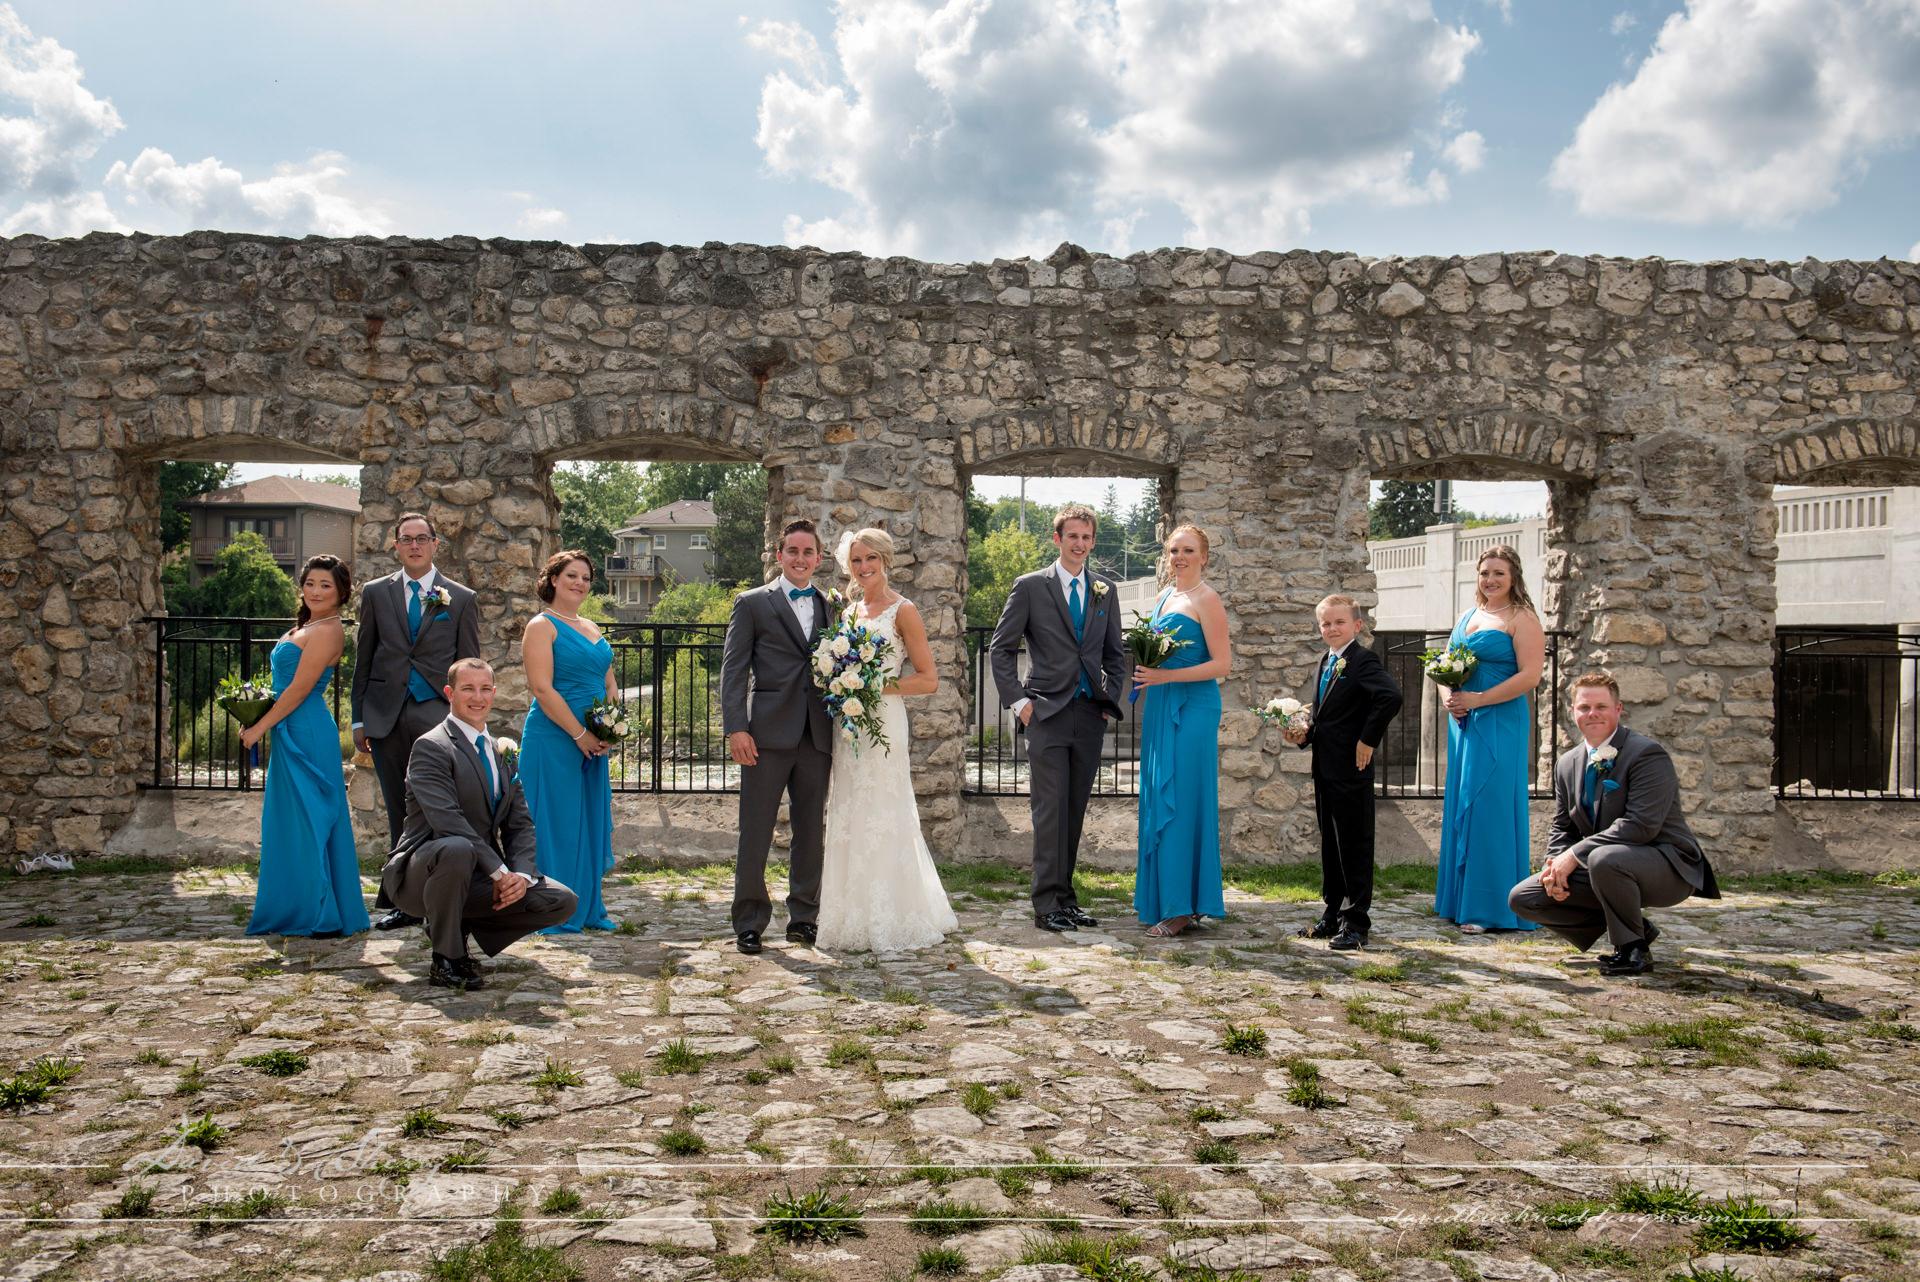 cambridge-mill-wedding-david-sherry-photography-6